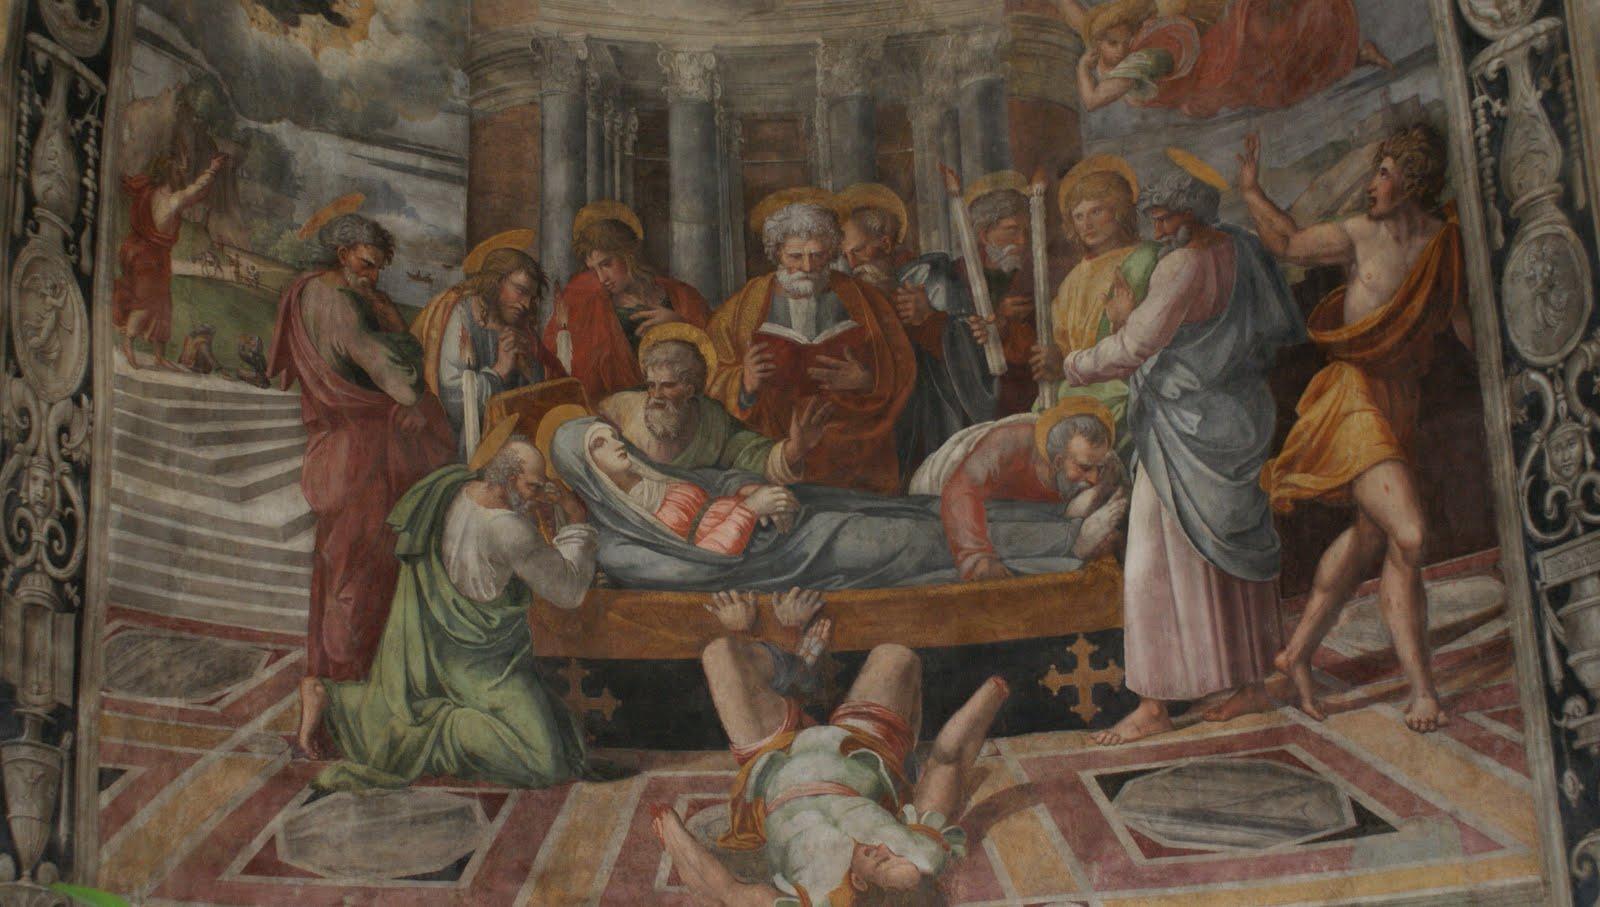 Matrimonio Trevignano Romano : Arte nascosta lungo la francigena trevignano romano